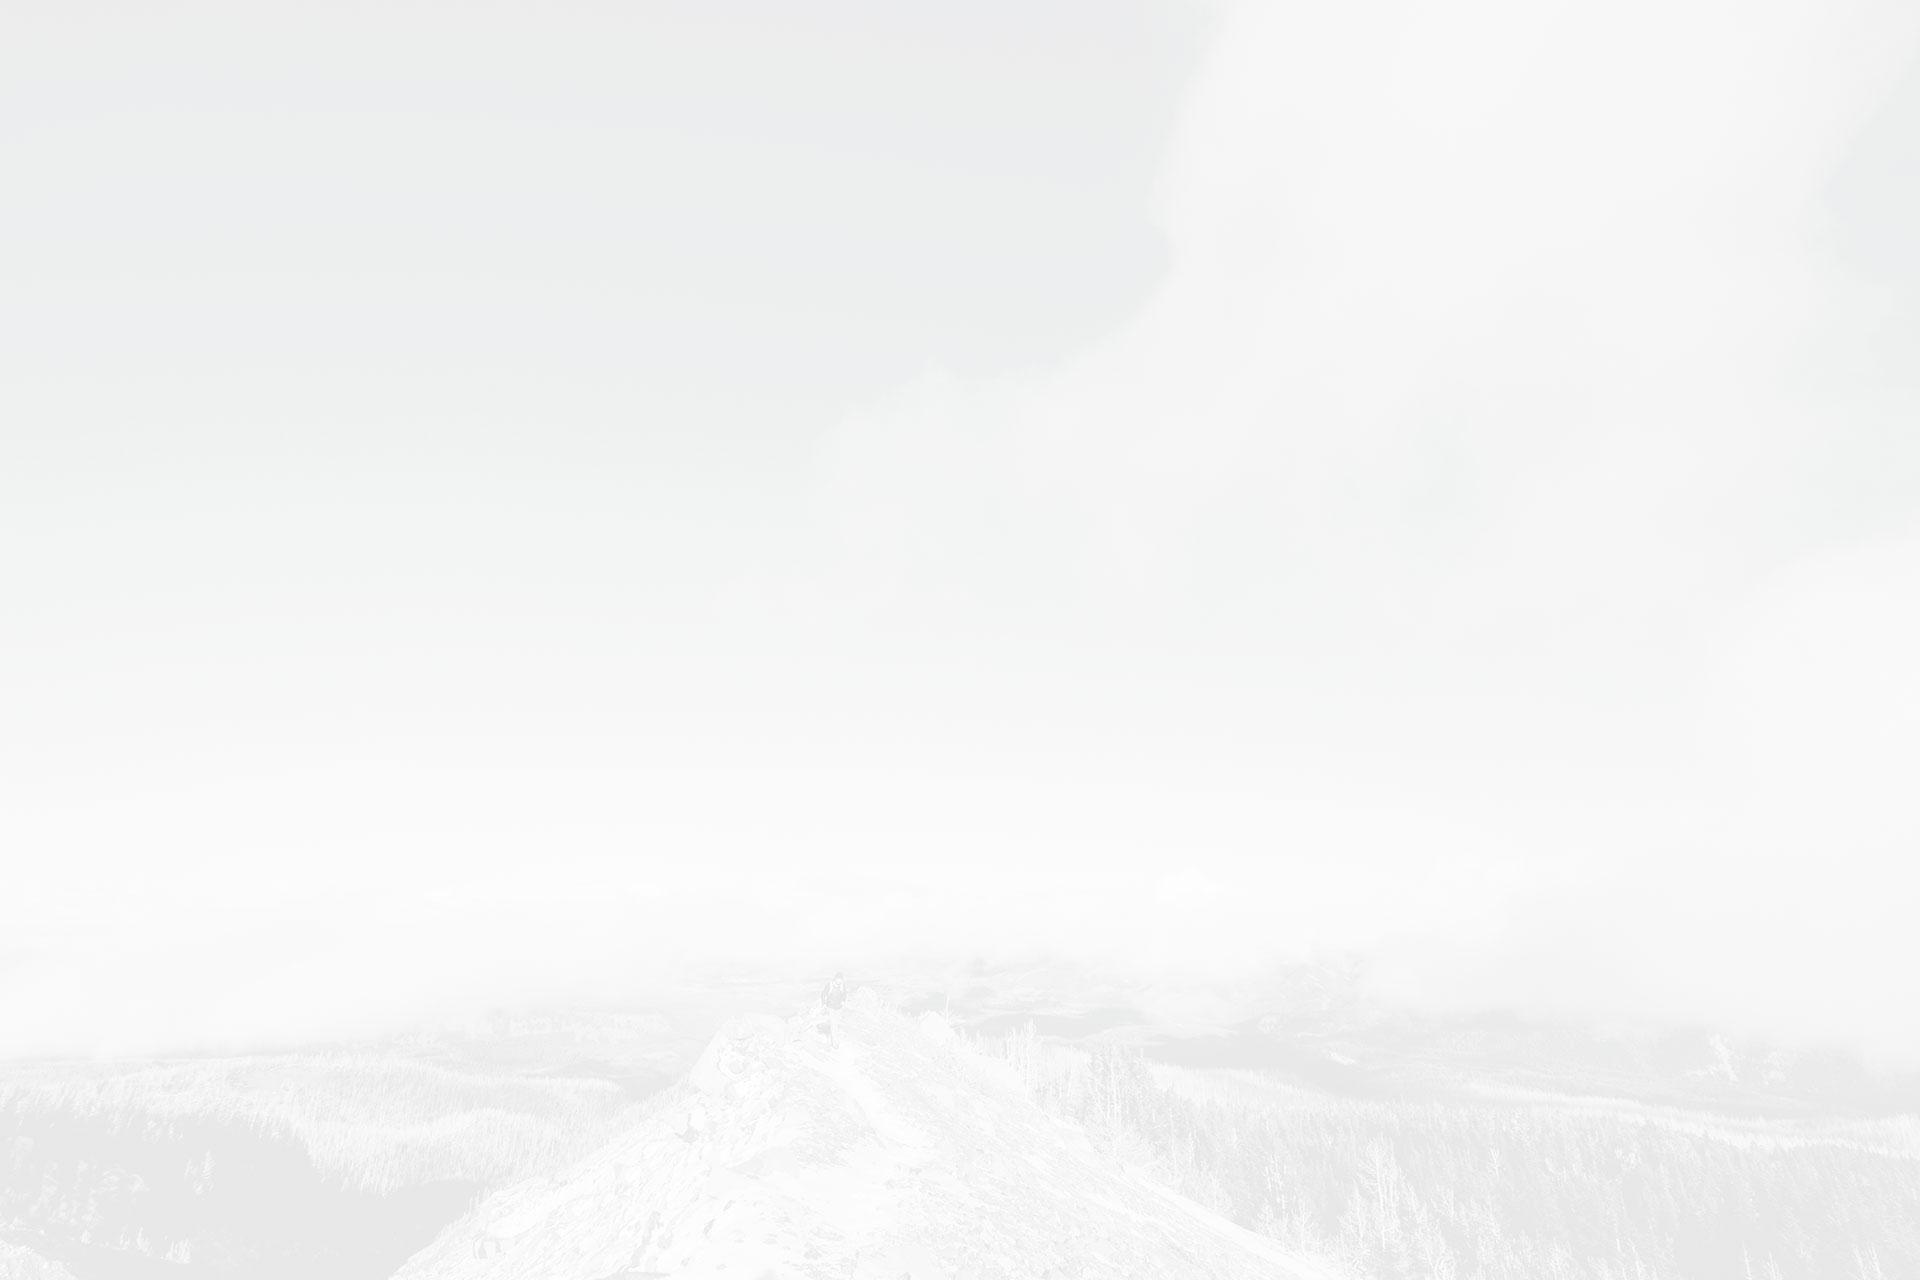 mountainbg.jpg